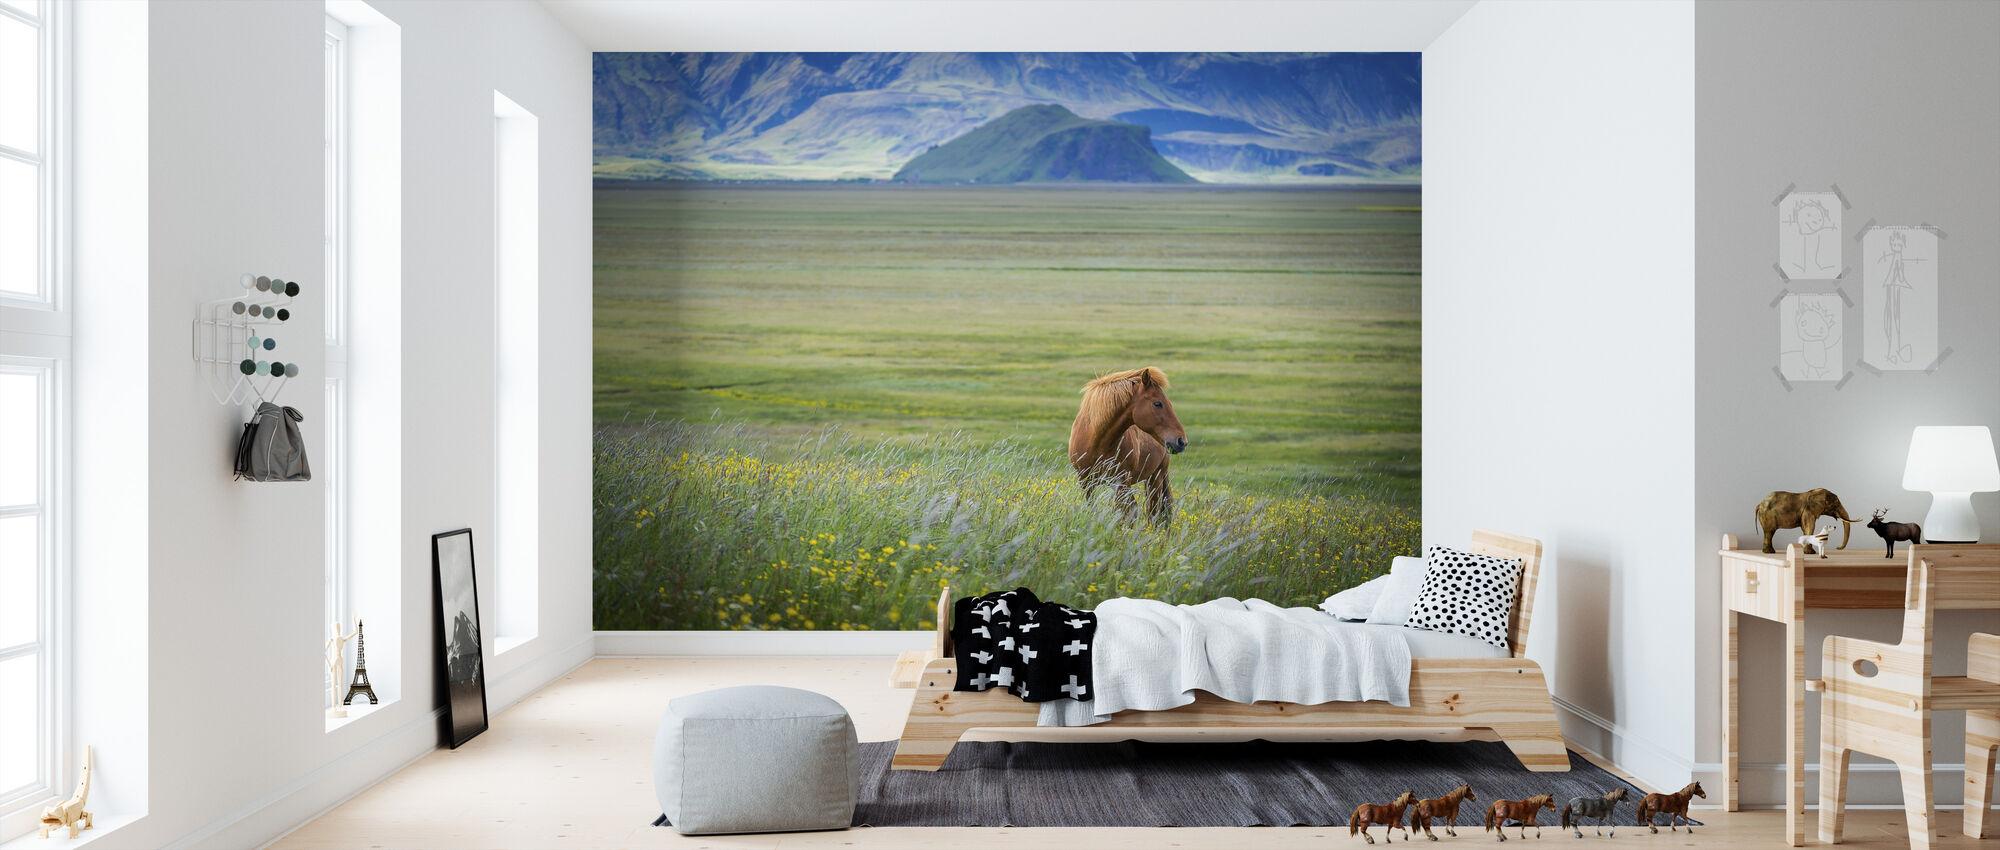 Iceland in a Nutshell - Wallpaper - Kids Room